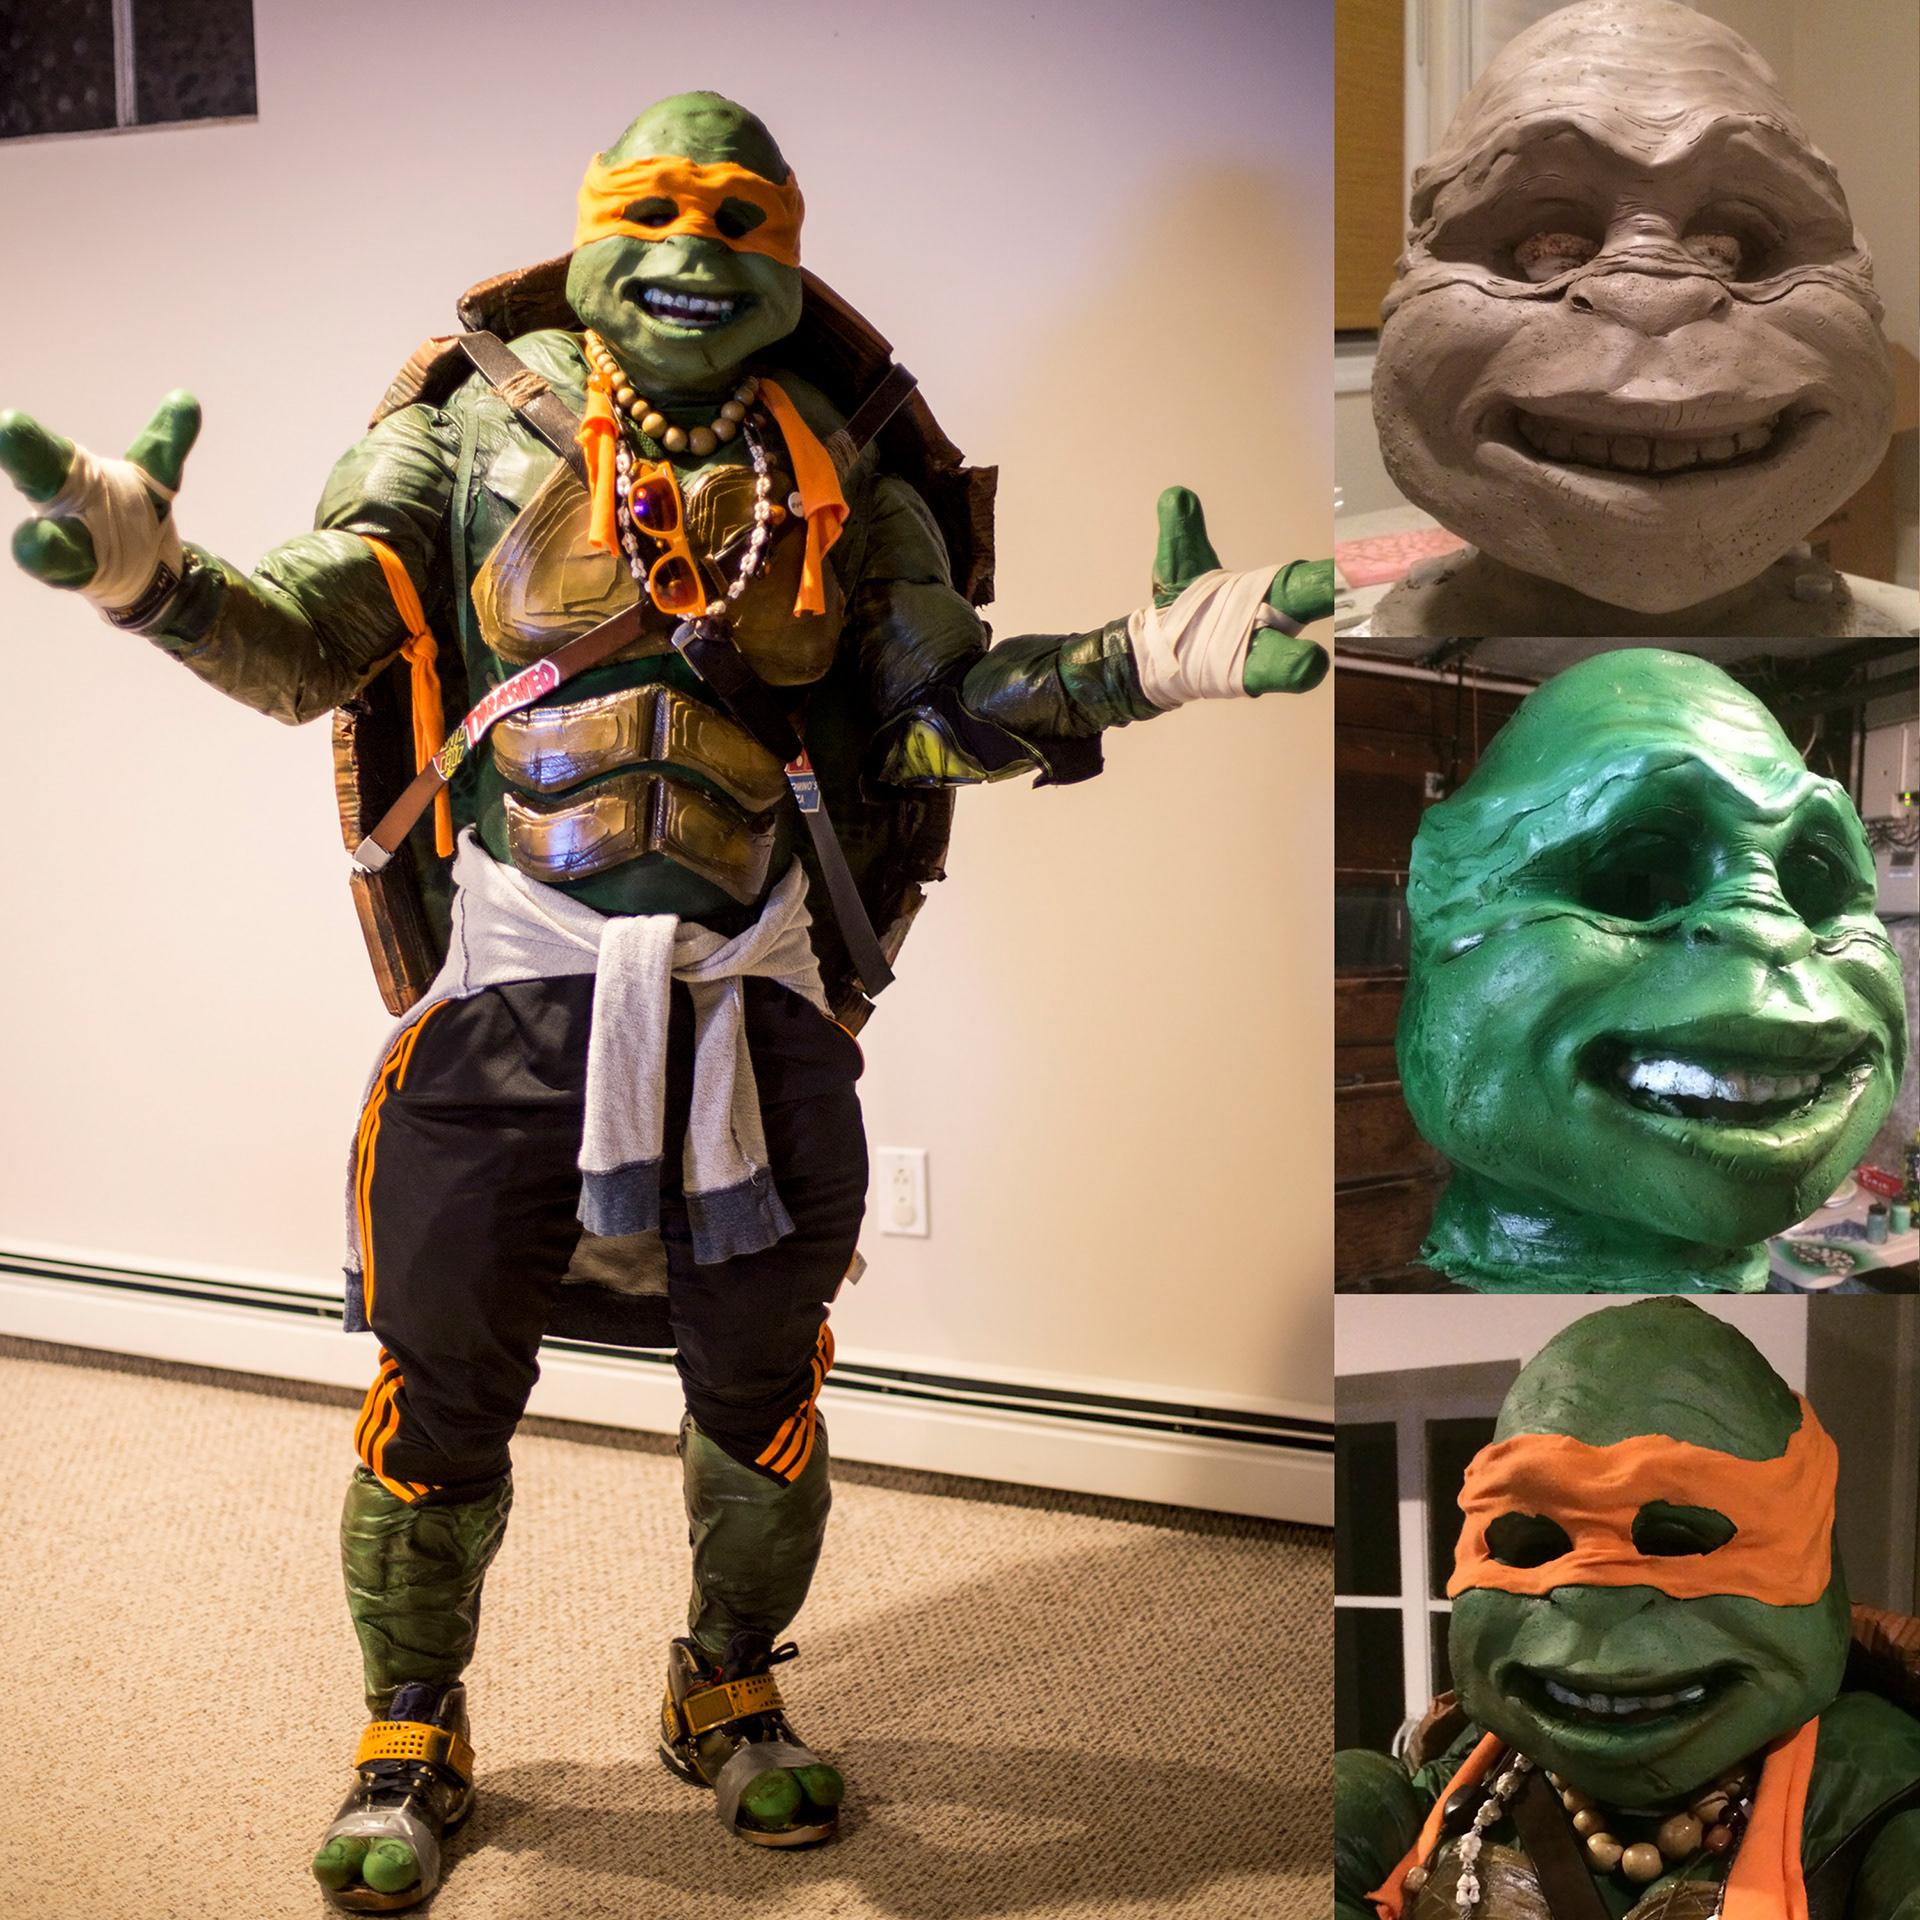 Renot lopes ninja turtle costume ninja turtle costume homemade halloween costume 1st place winner 2015 boston costume contest solutioingenieria Image collections